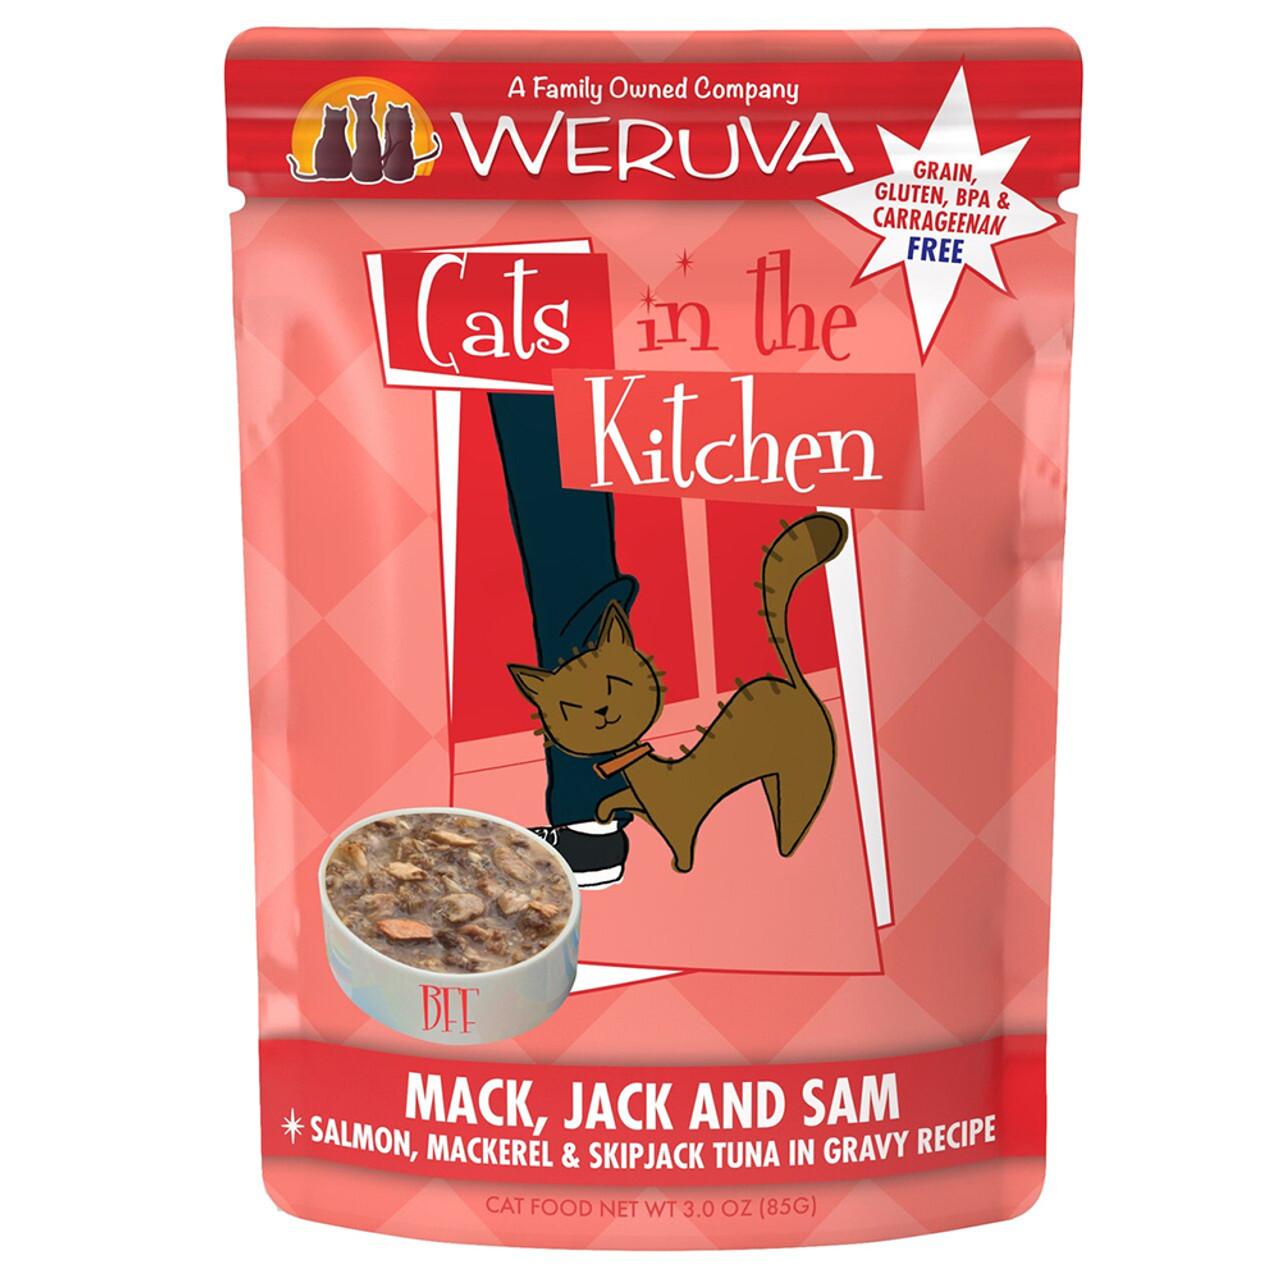 Cats in the Kitchen Mack, Jack and Sam Salmon, Mackerel & Skip Jack Tuna in Gravy Recipe Cat Food Pouch